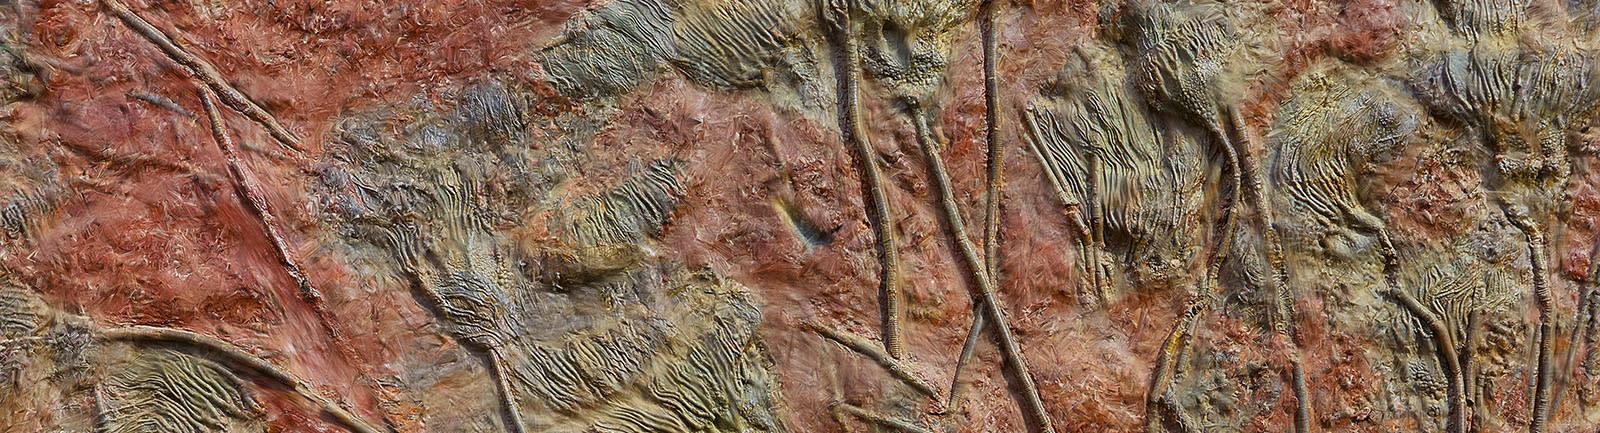 <div class='title'>           Fossil Flowers banner         </div>